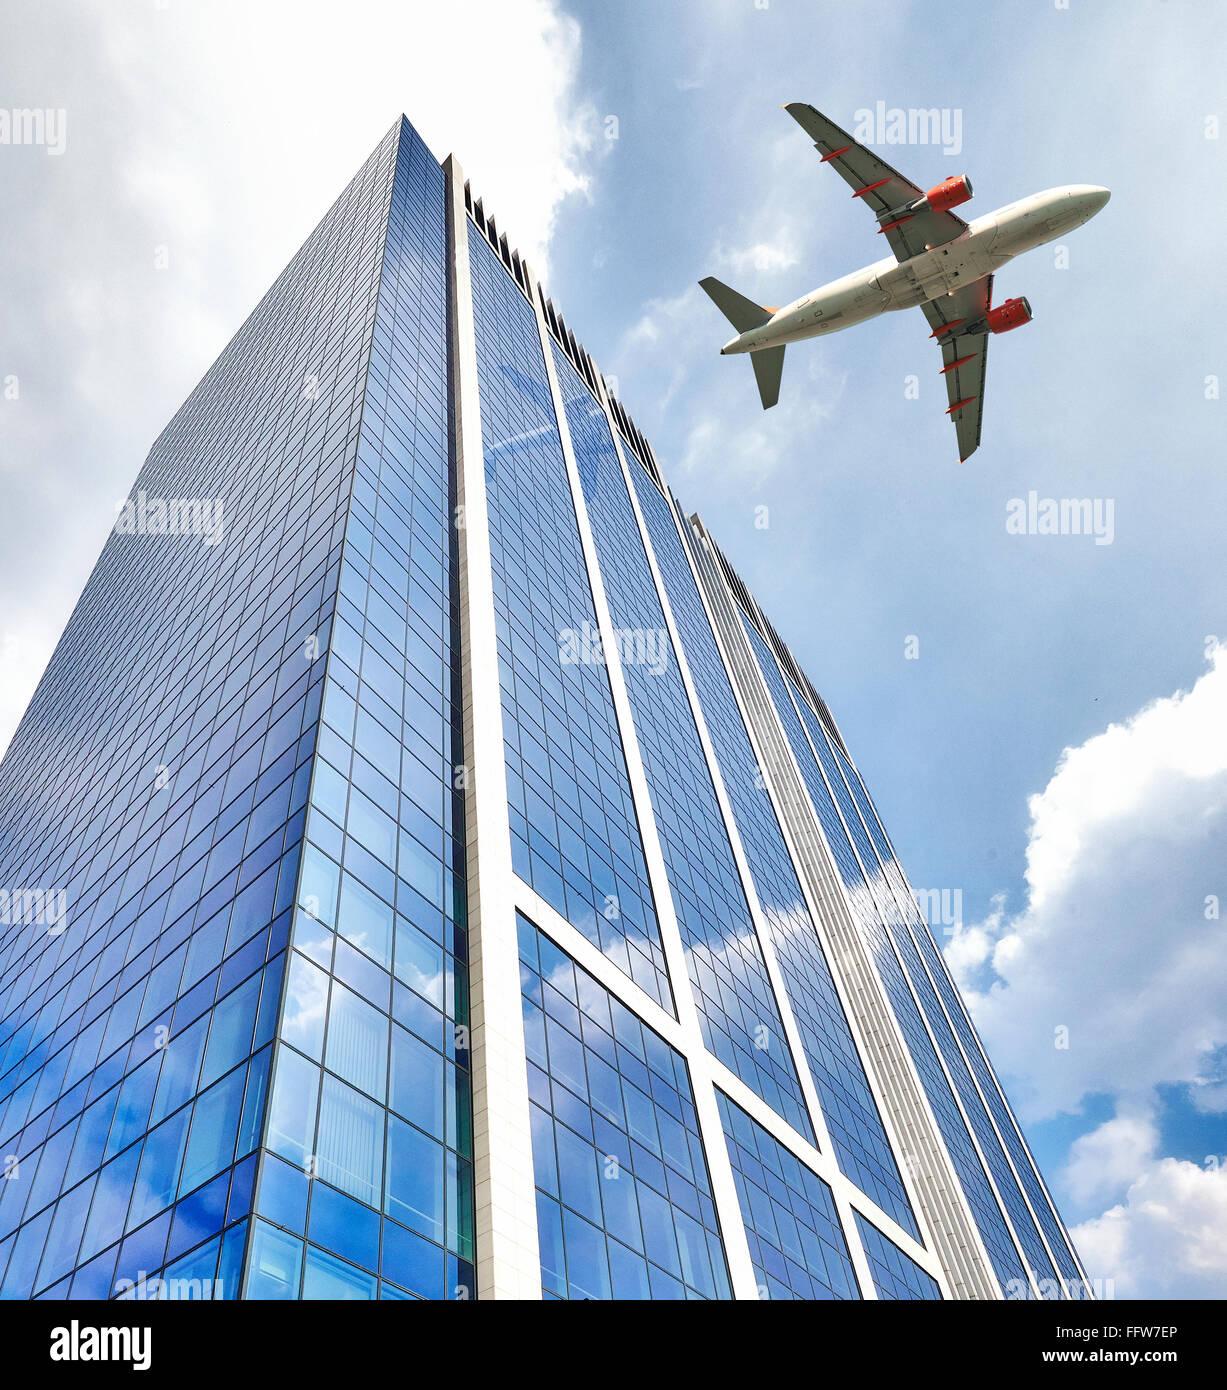 Plane Over Building Stock Photos & Plane Over Building